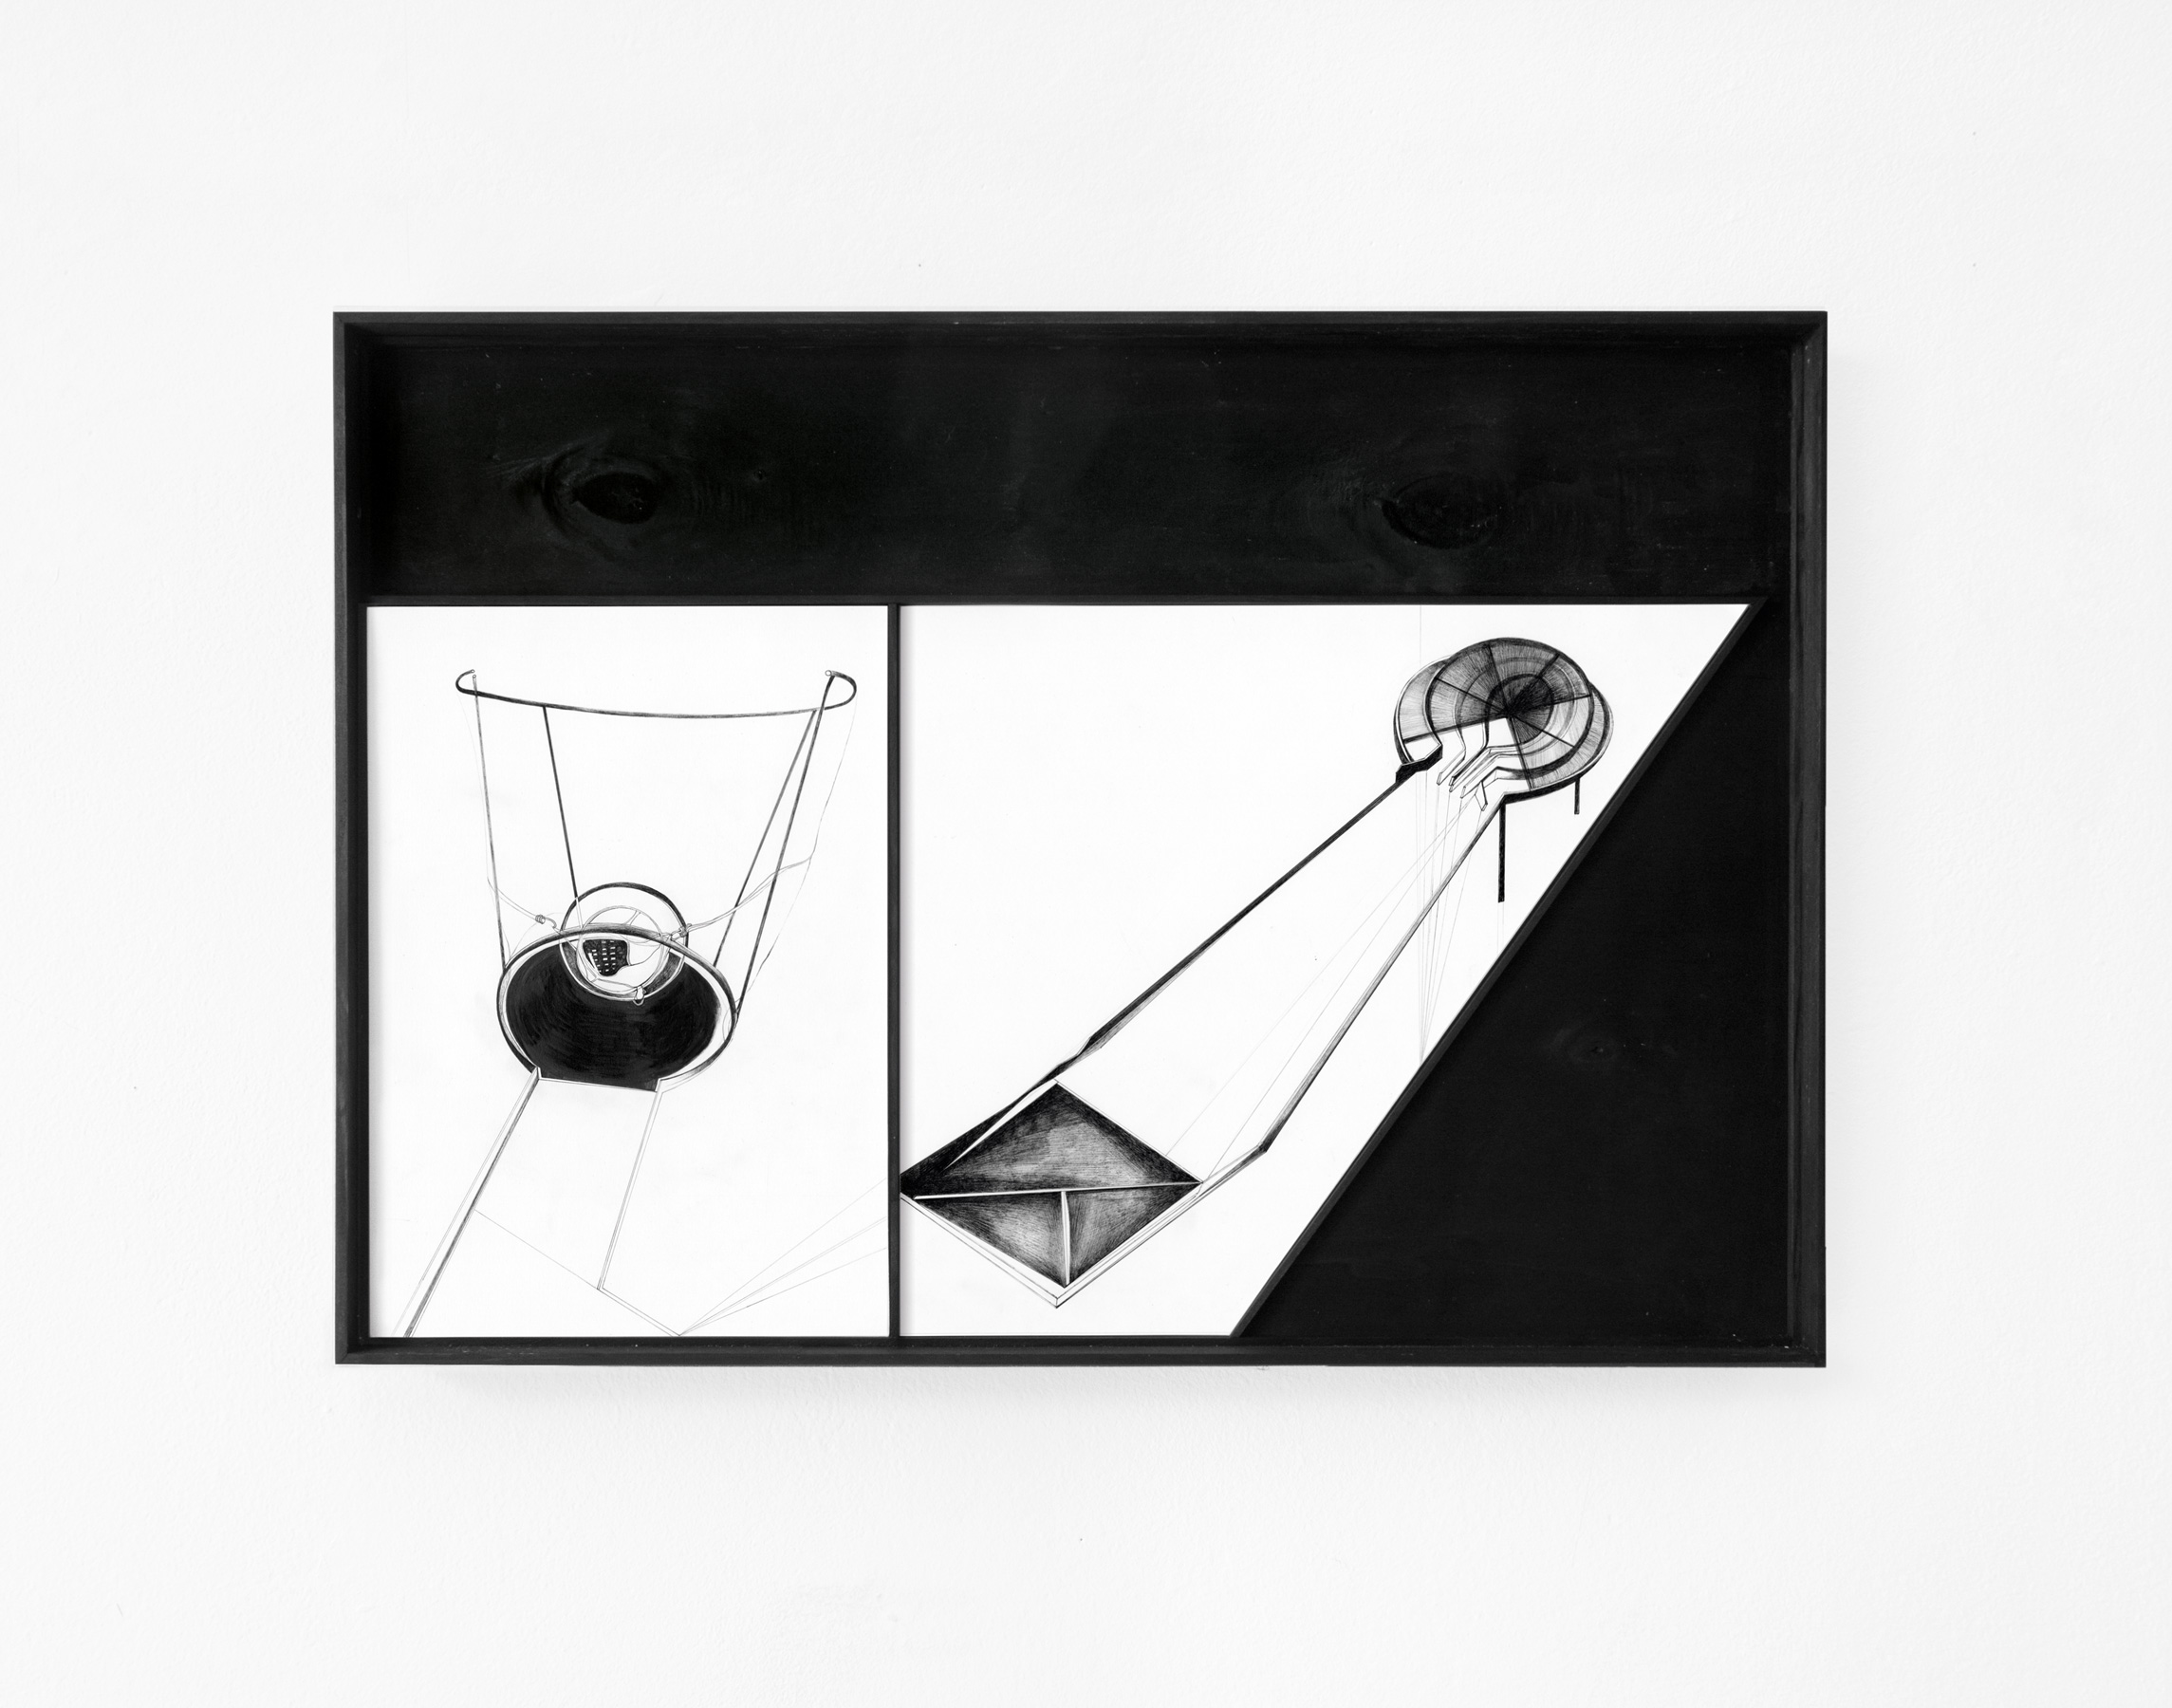 Nina Annabelle Märkl | Scapes 1 | Ink on paper, cutouts, wood | 40 x 60 cm | 2014